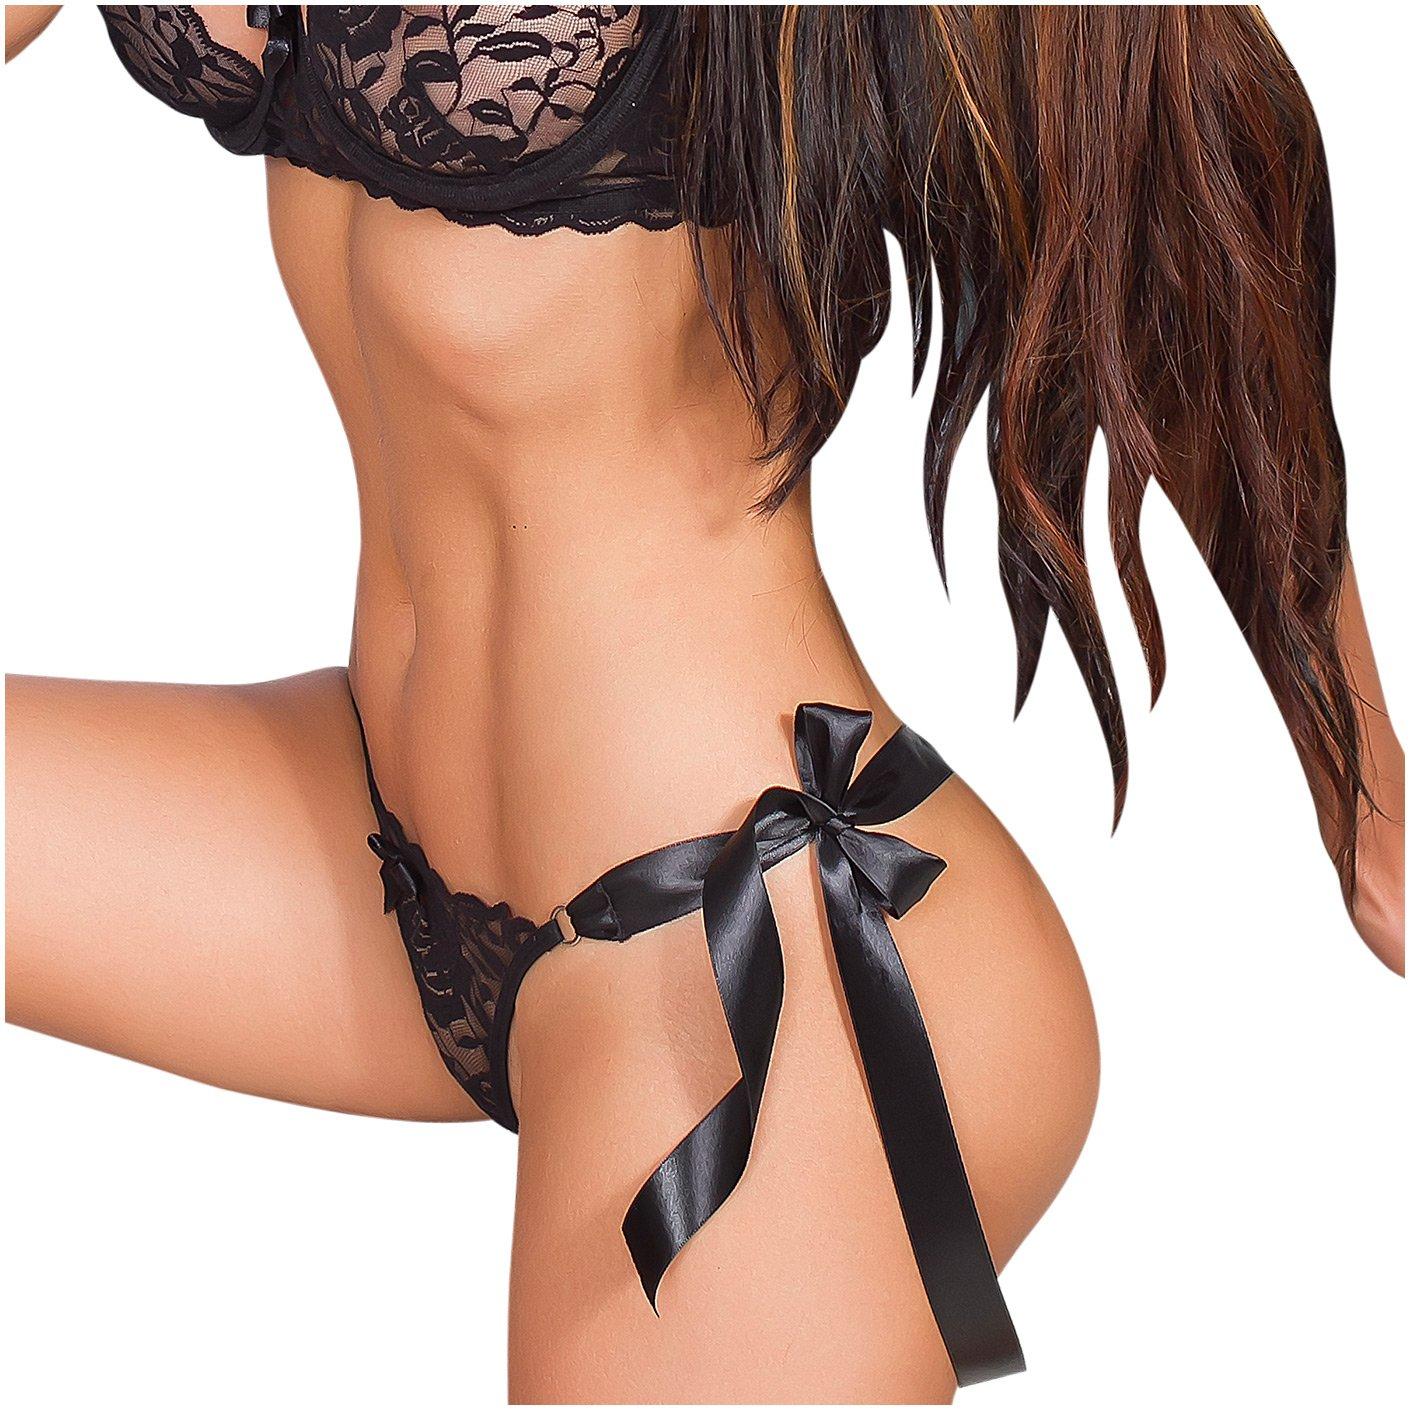 Amawi 1036 Sexy Lace Thong Panties For Women Underwear Lenceria Erotica Para Mujer Ropa Interior Femenina Sensual Colombiana de Encaje Black/Negro at Amazon ...